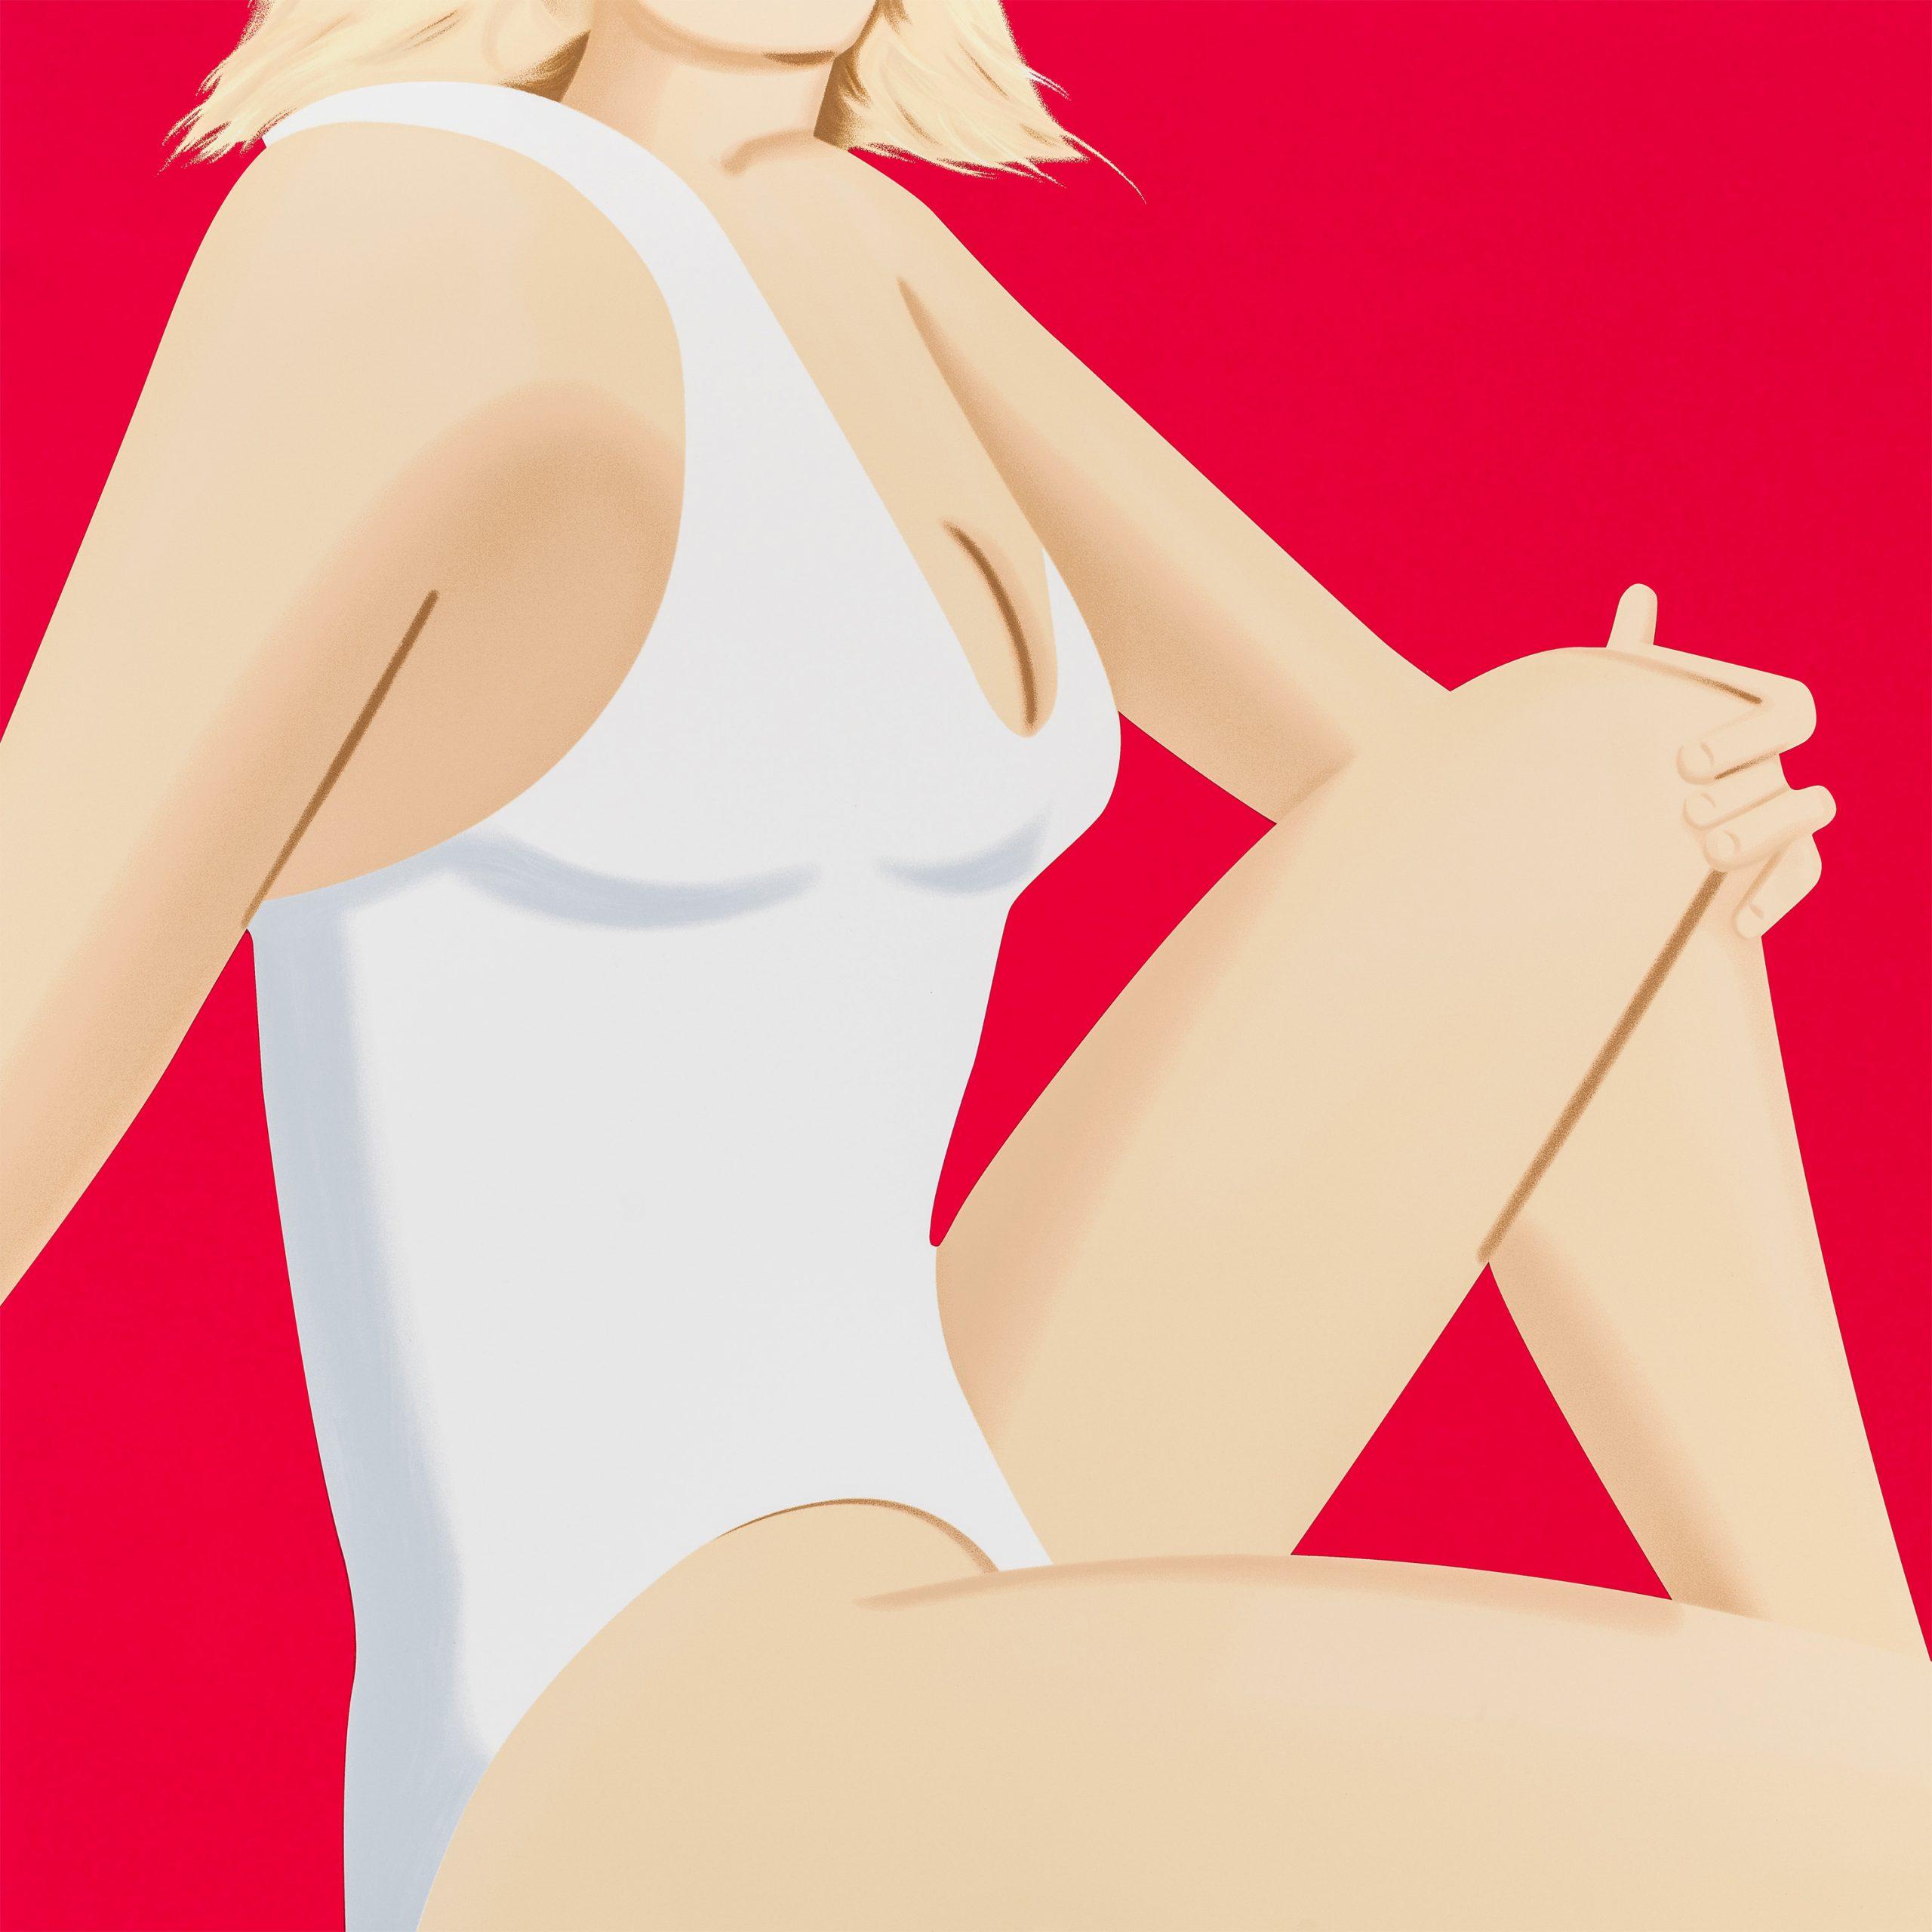 Coca-cola Girl 7 by Alex Katz